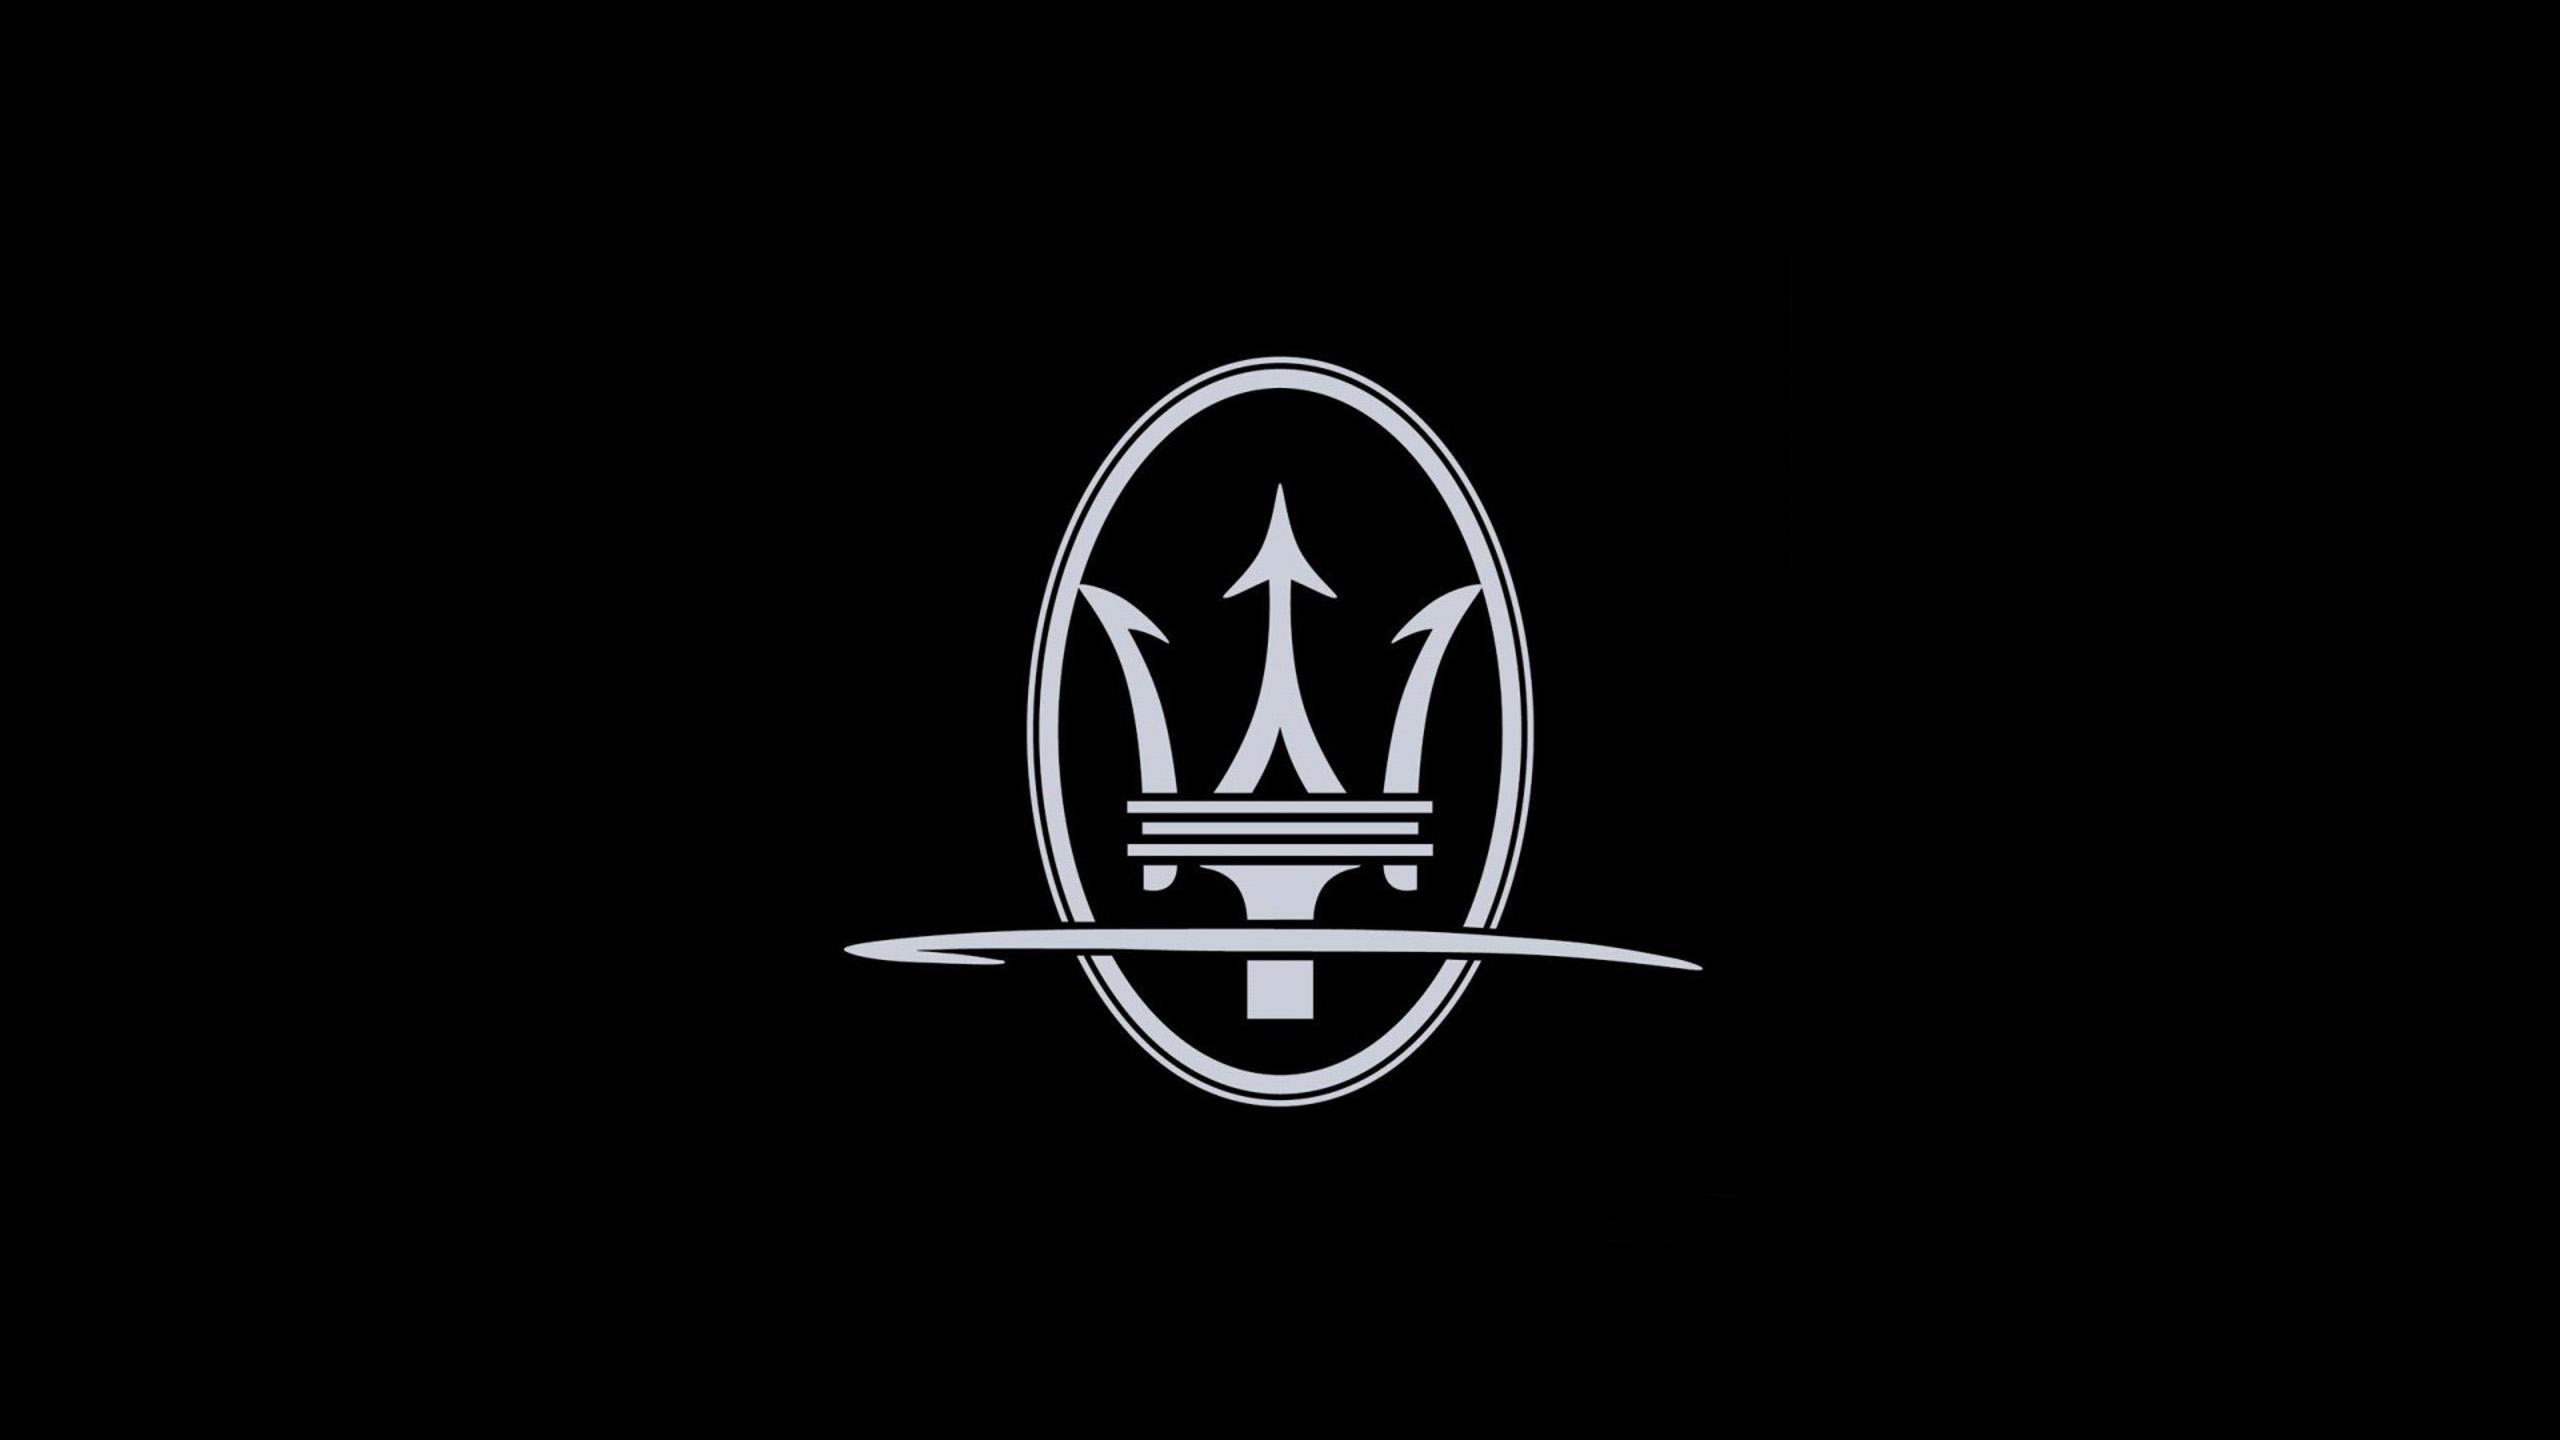 46] Maserati Logo Wallpaper on WallpaperSafari 2560x1440